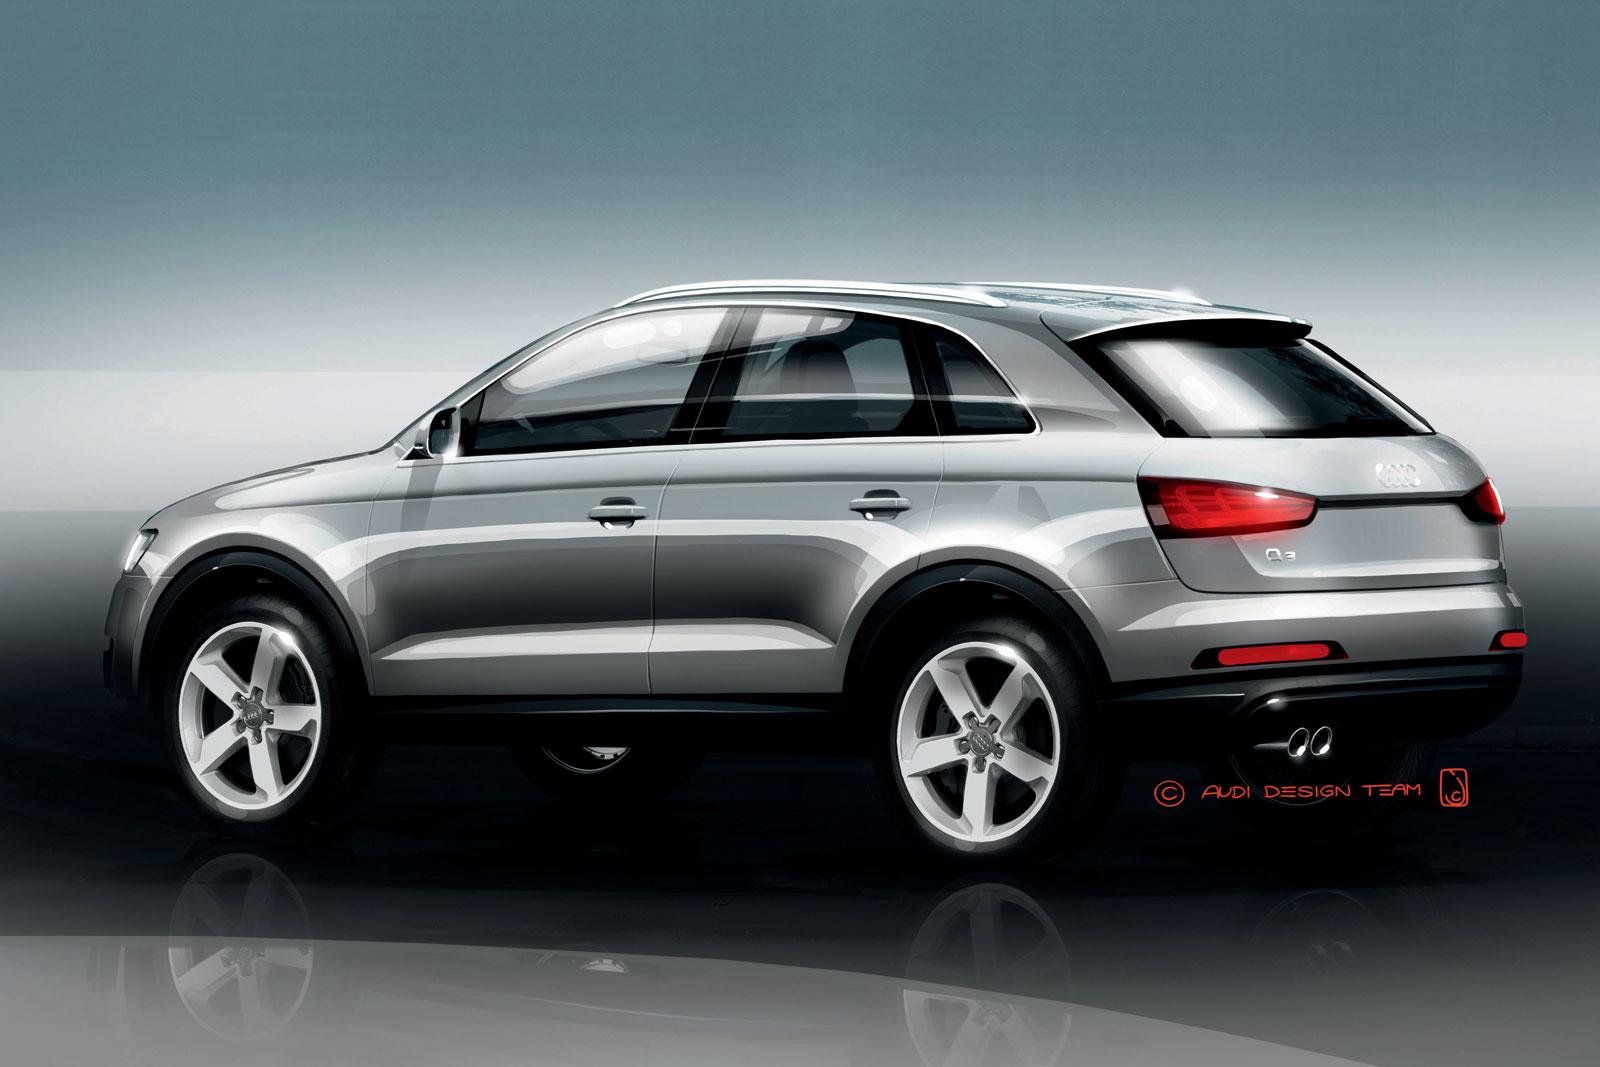 http://1.bp.blogspot.com/-u4PBbo8MeUE/TZ9dOh18rvI/AAAAAAAAEcM/5PvTIKH4ofE/s1600/Audi-Q3-Teaser-Sketch-2.jpg